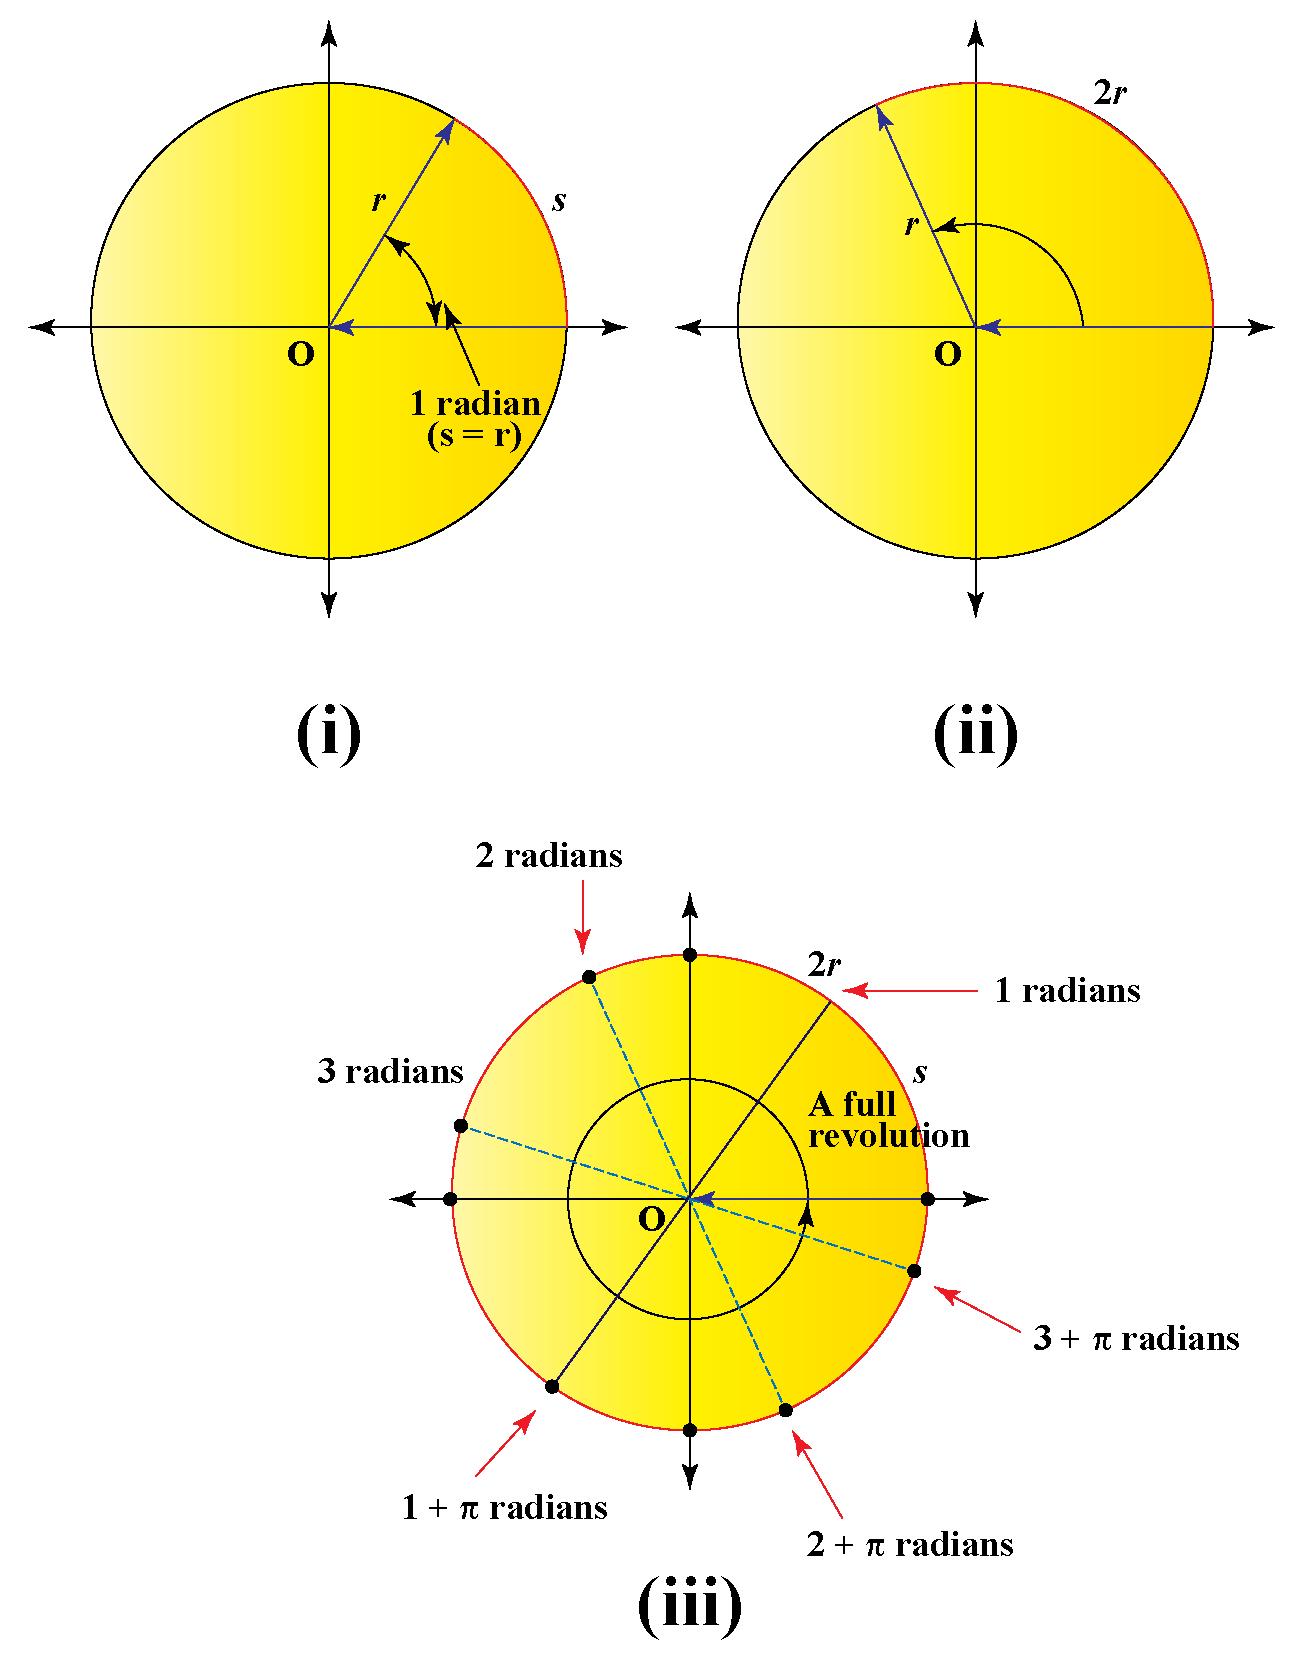 radians representation